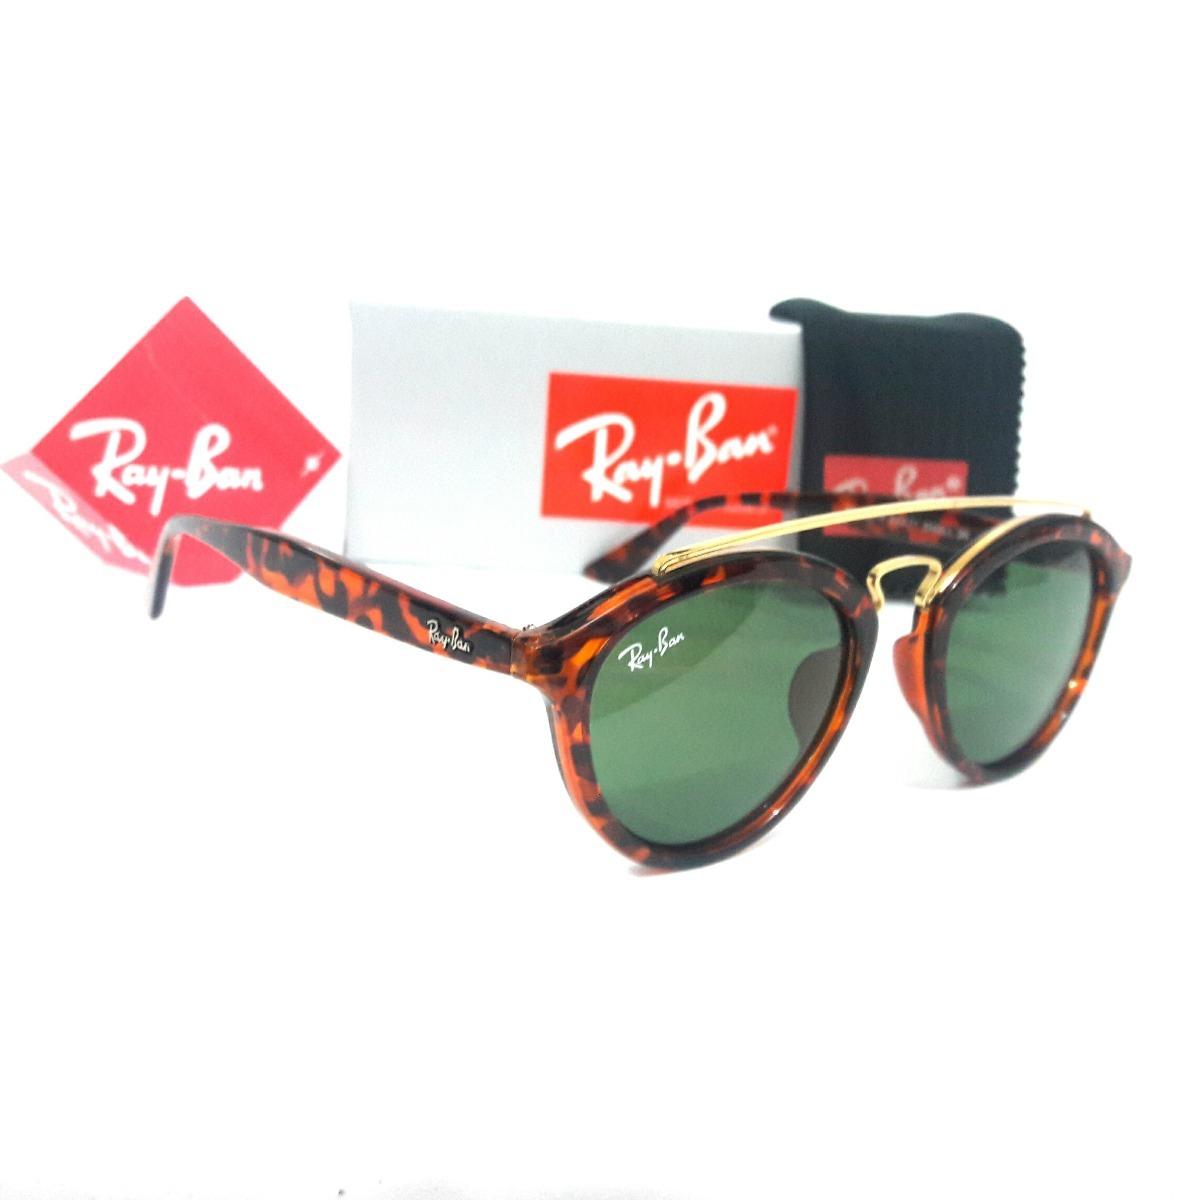 ff956409d12a óculos de sol rayban new gatsby feminino premium cristal lux. Carregando  zoom.